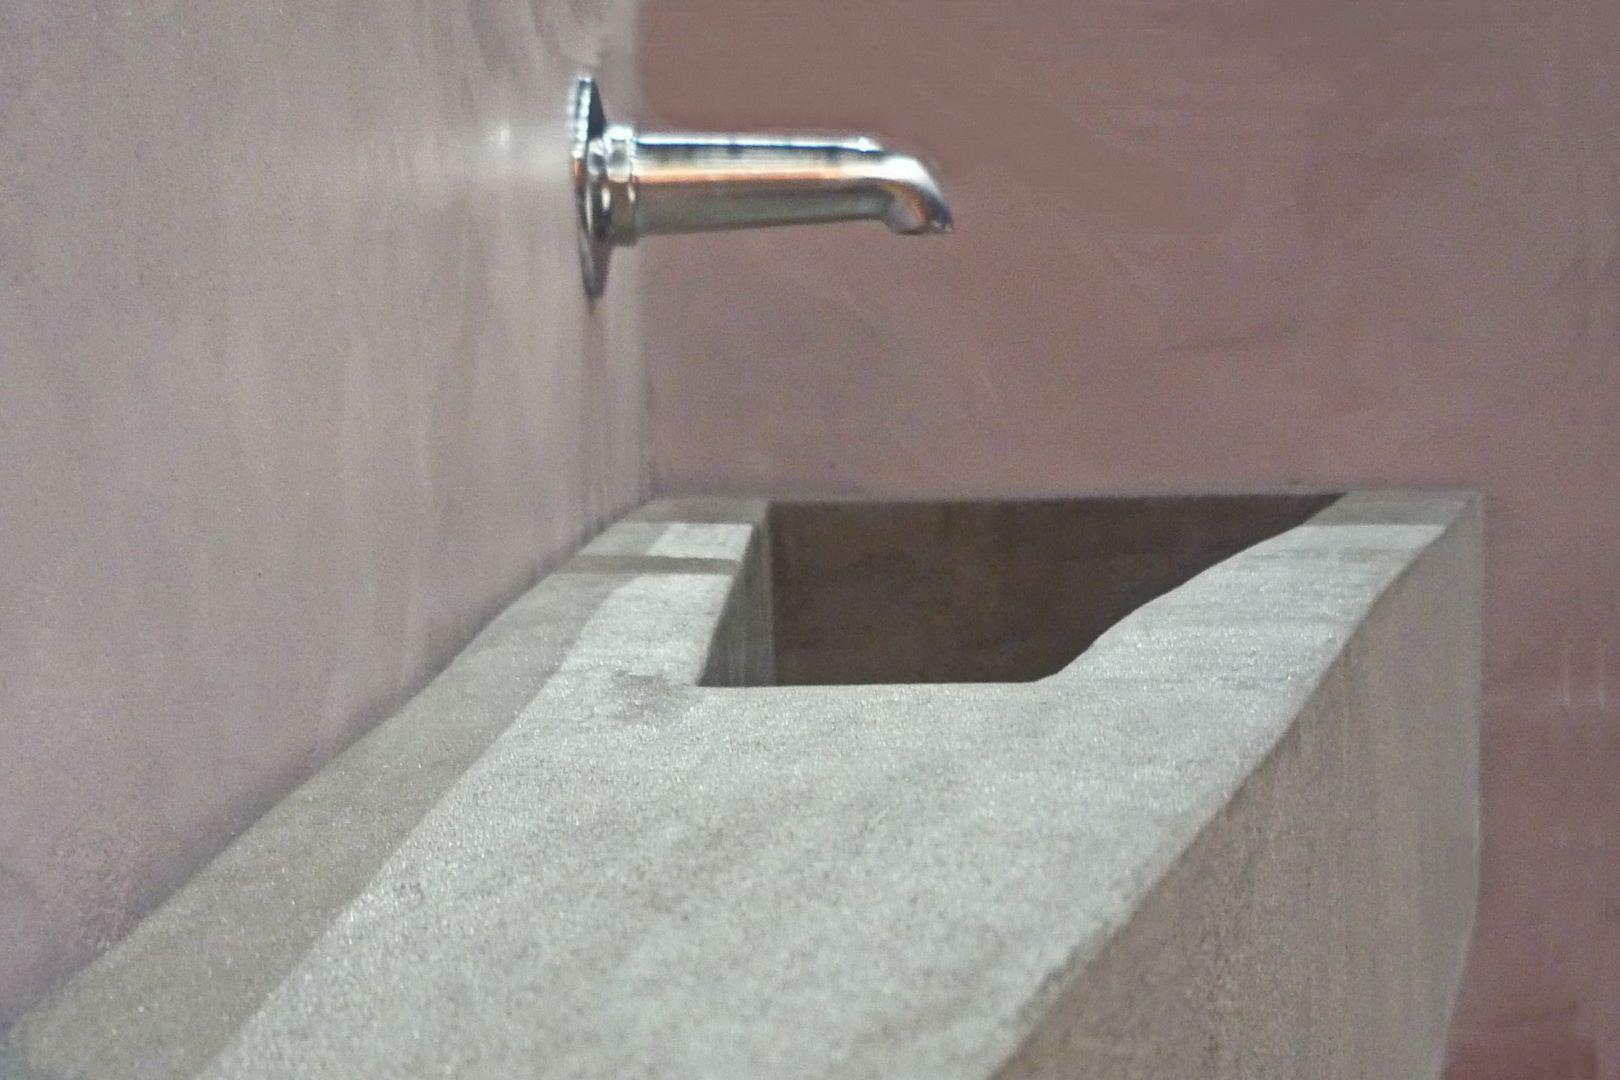 https://terra-sol.hr/wp-content/uploads/2020/06/umivaonici_beton_terra_sol_06.jpg